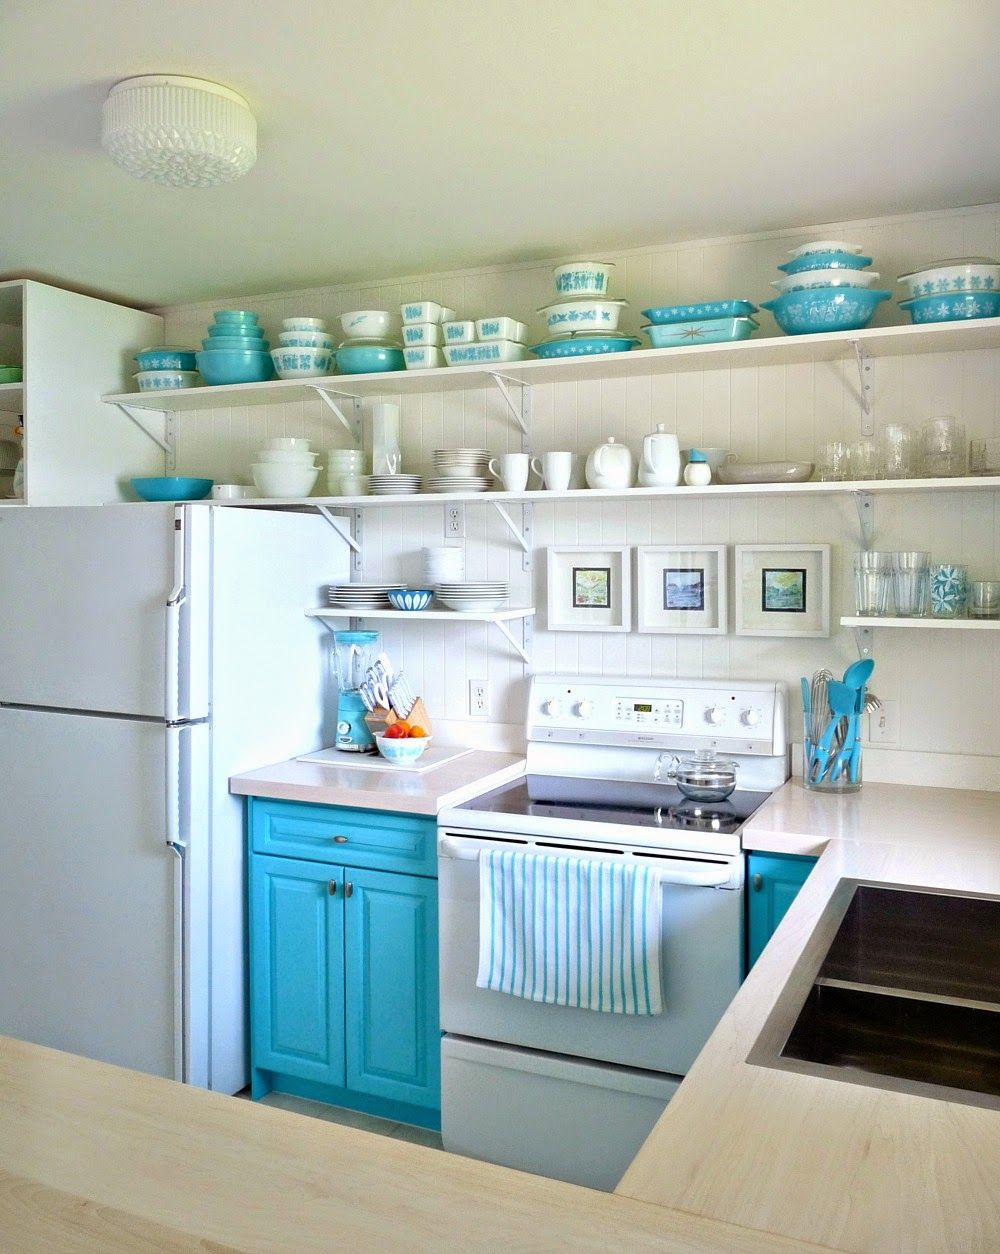 Turquoise Kitchen Dans Le Lakehouse Basement Kitchen Inspiration Turquoise Aqua